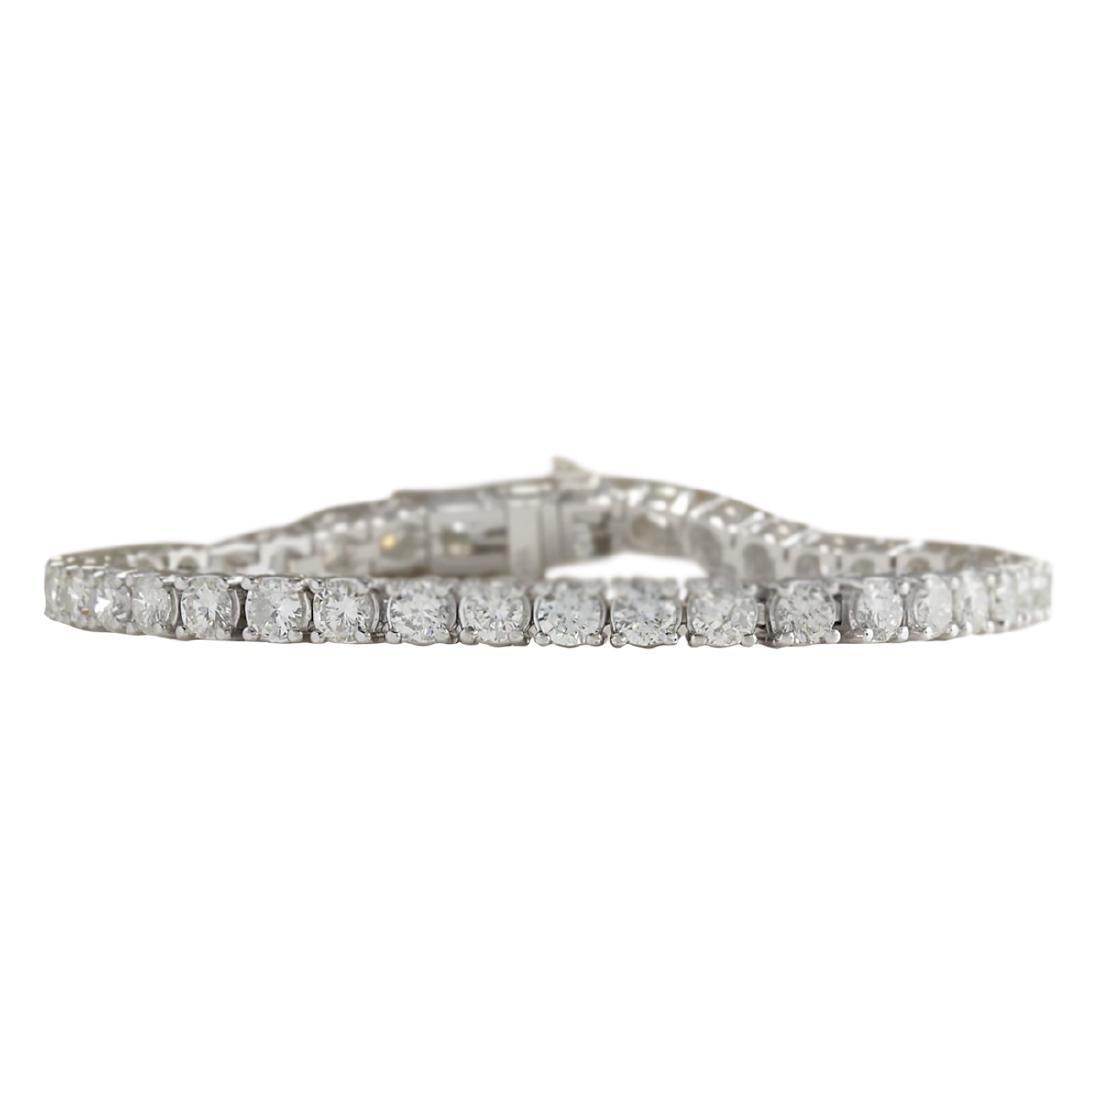 10.00 CTW Natural Dimond Bracelet In 18K Solid White